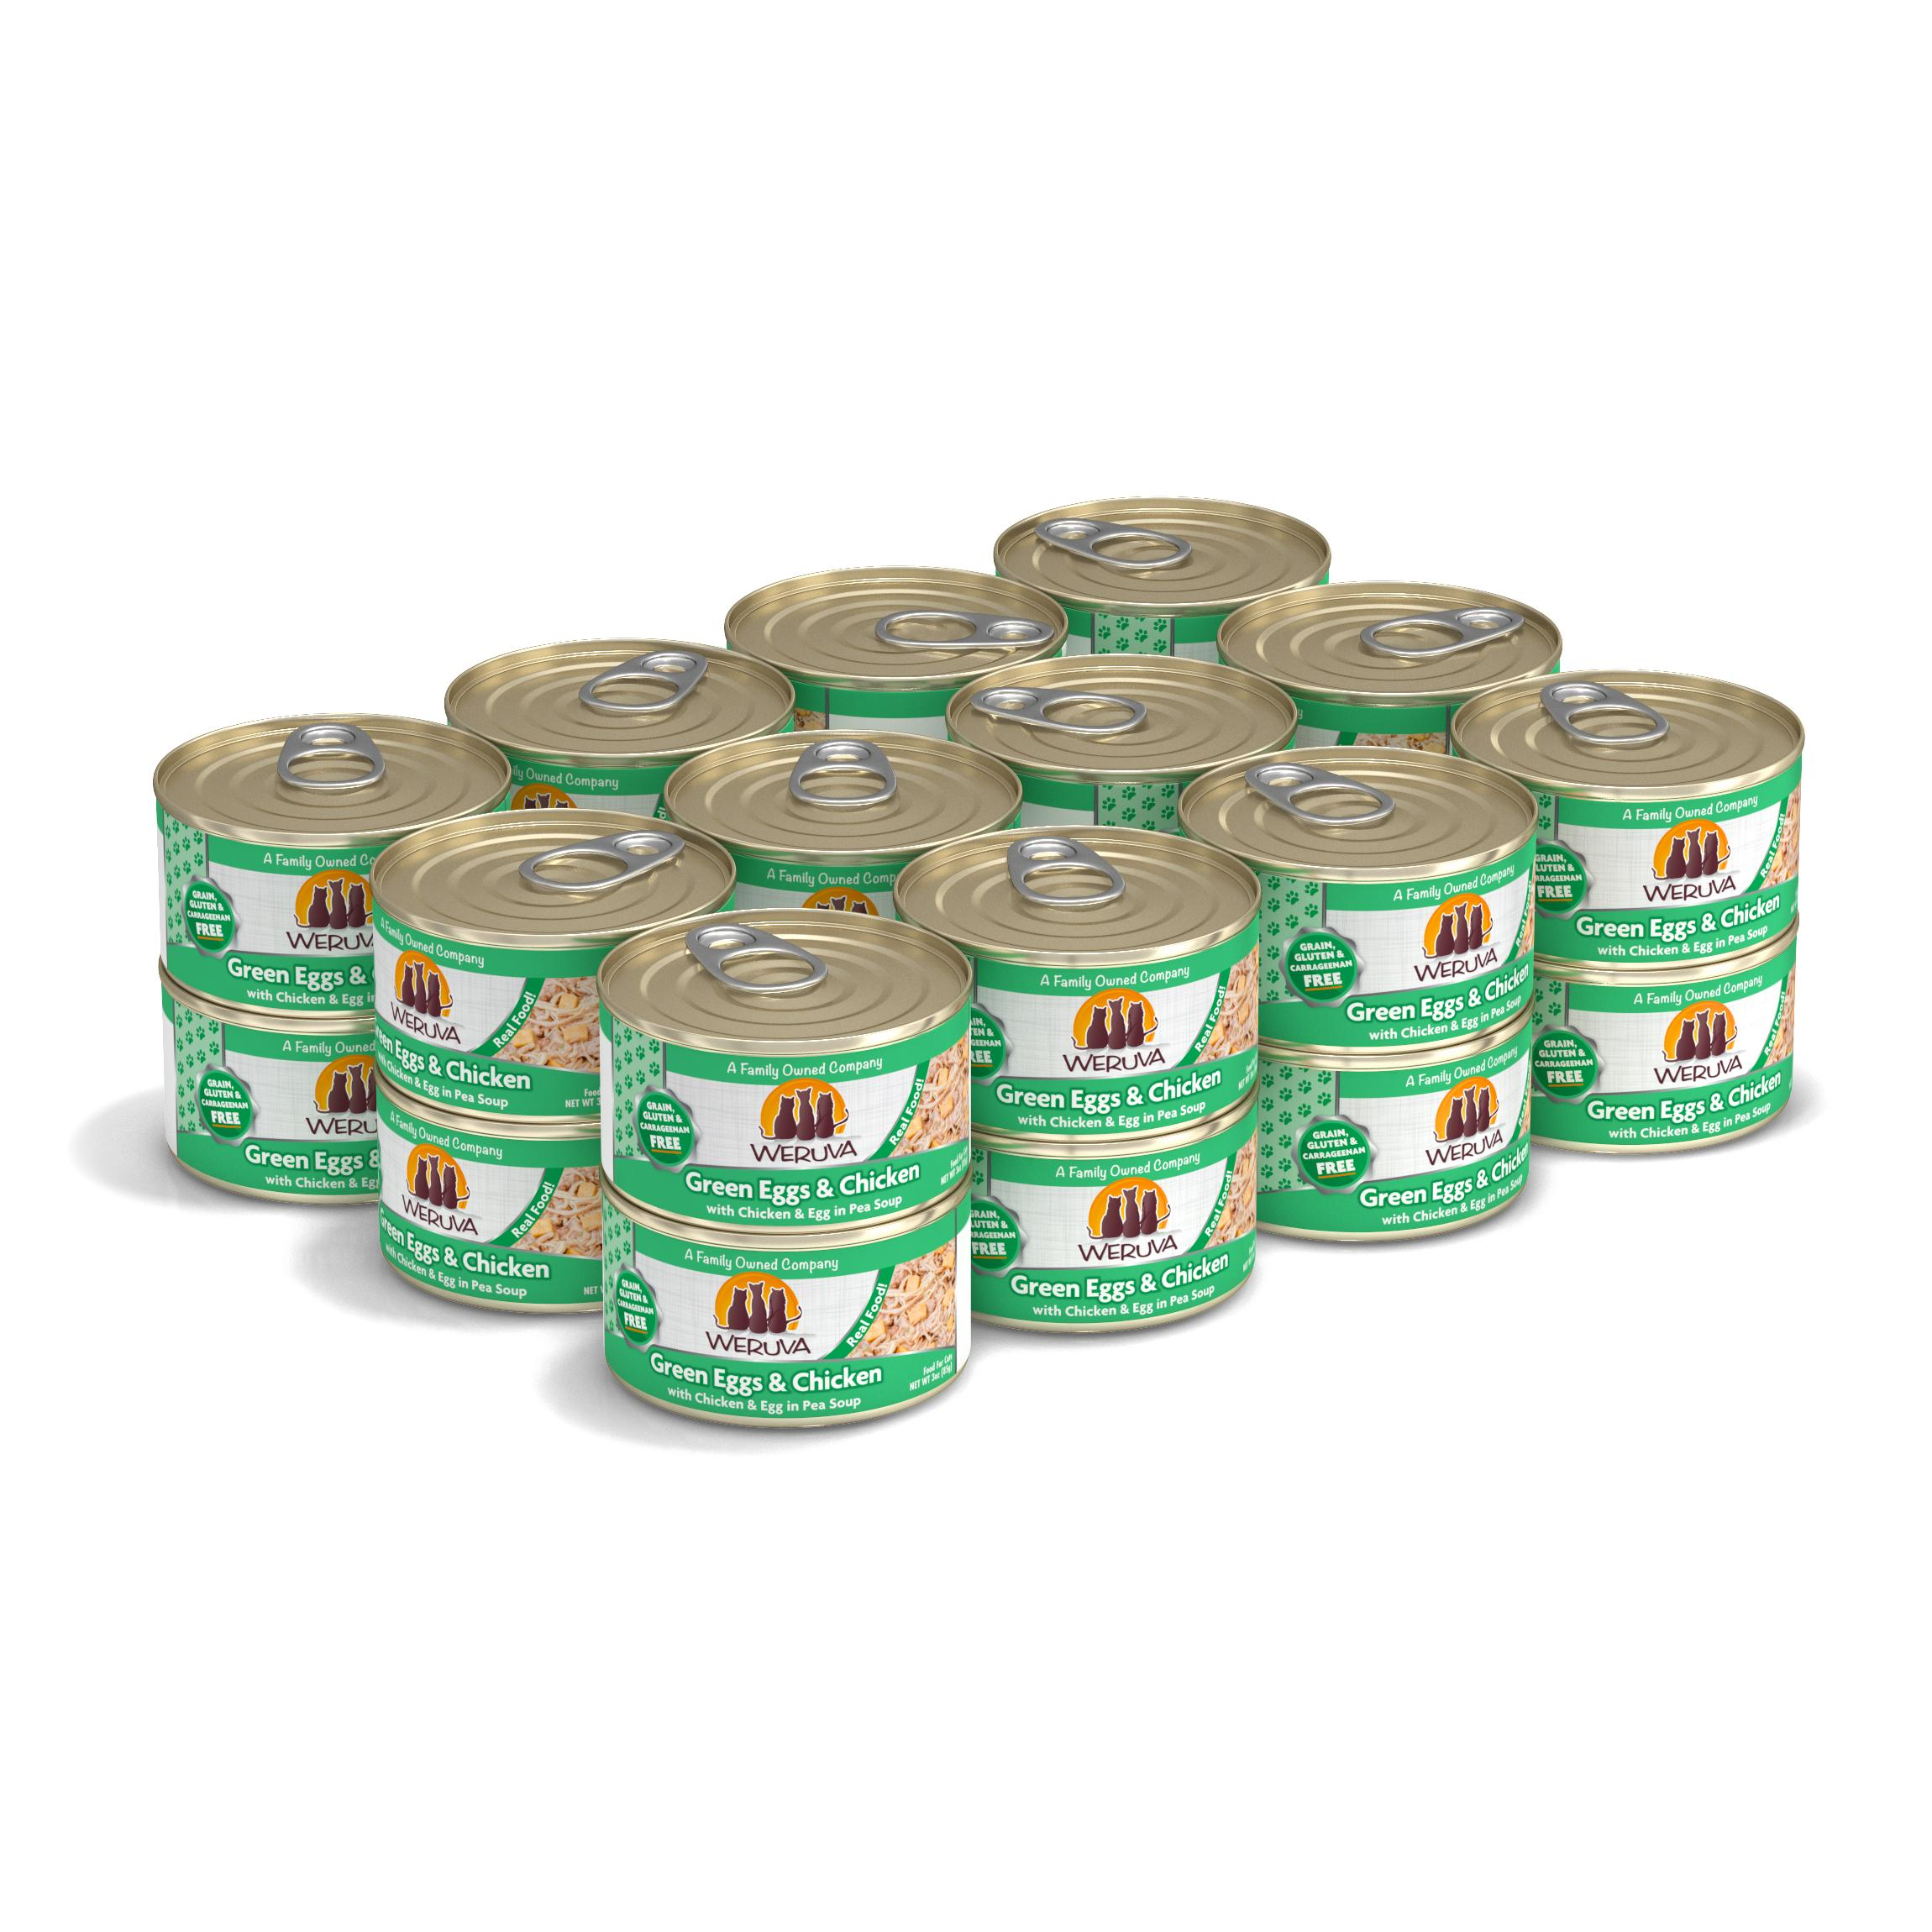 Weruva Cat Classic Green Eggs & Chicken with Chicken, Egg & Greens in Gravy Grain-Free Wet Cat Food, 3-oz, case of 24